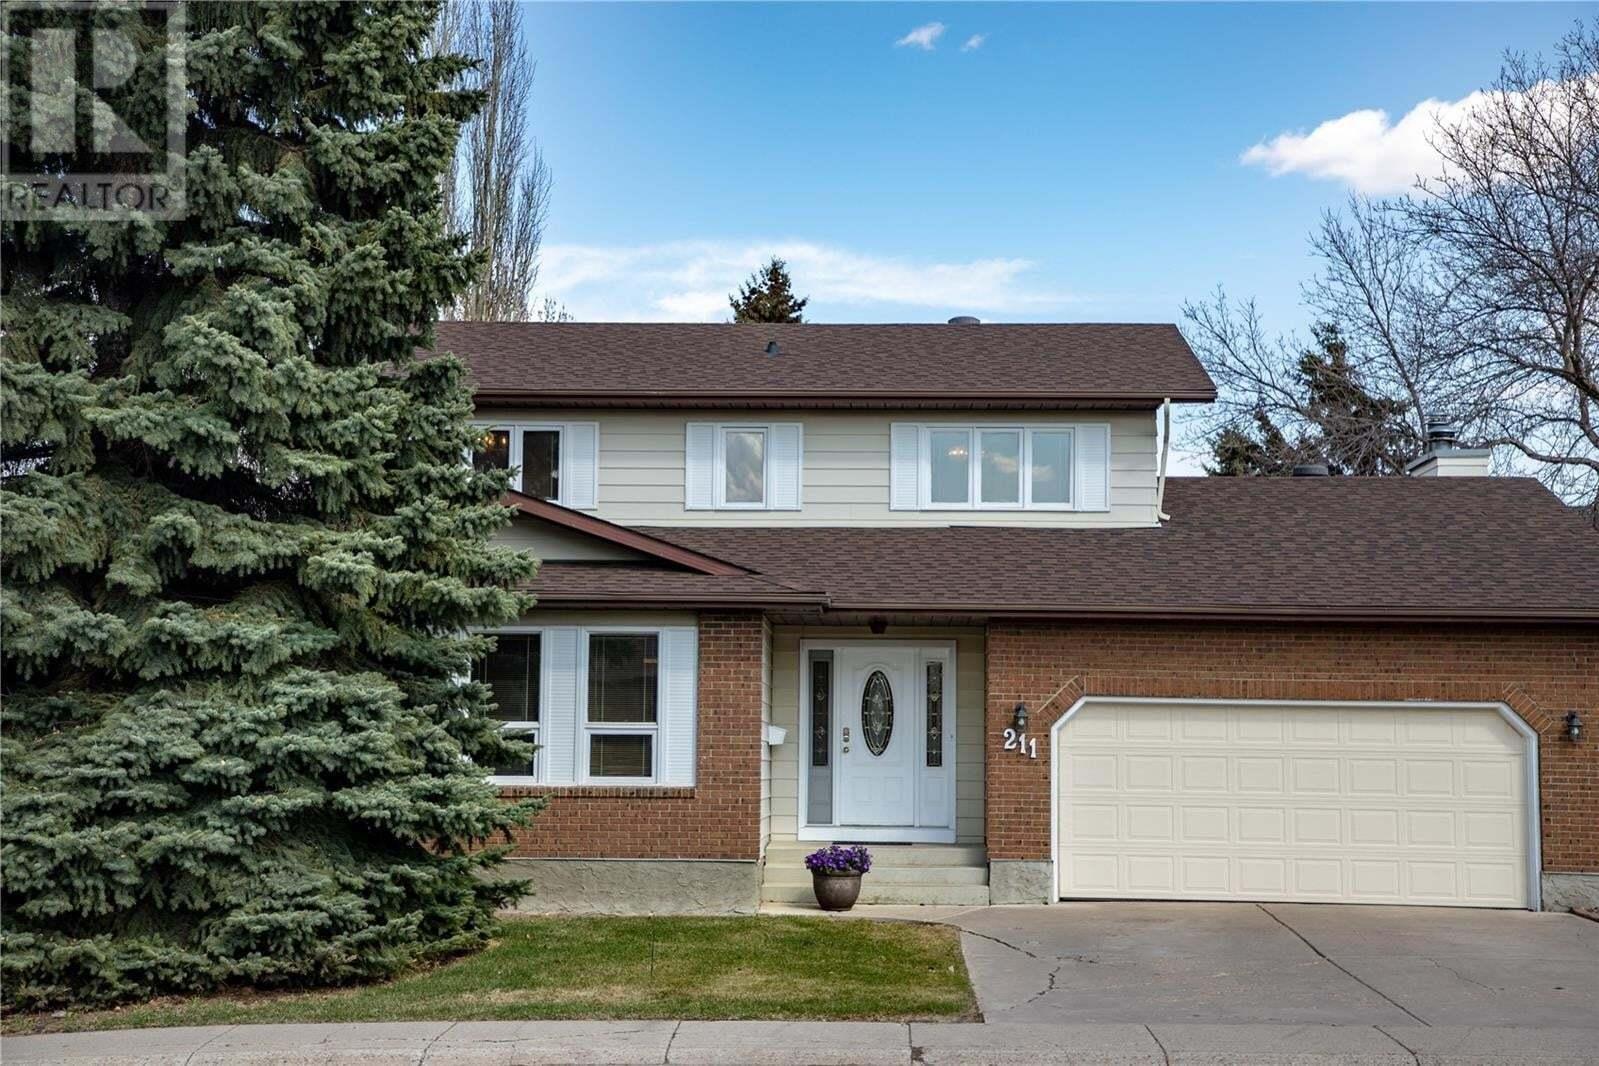 House for sale at 211 Whiteshore Cres Saskatoon Saskatchewan - MLS: SK810968